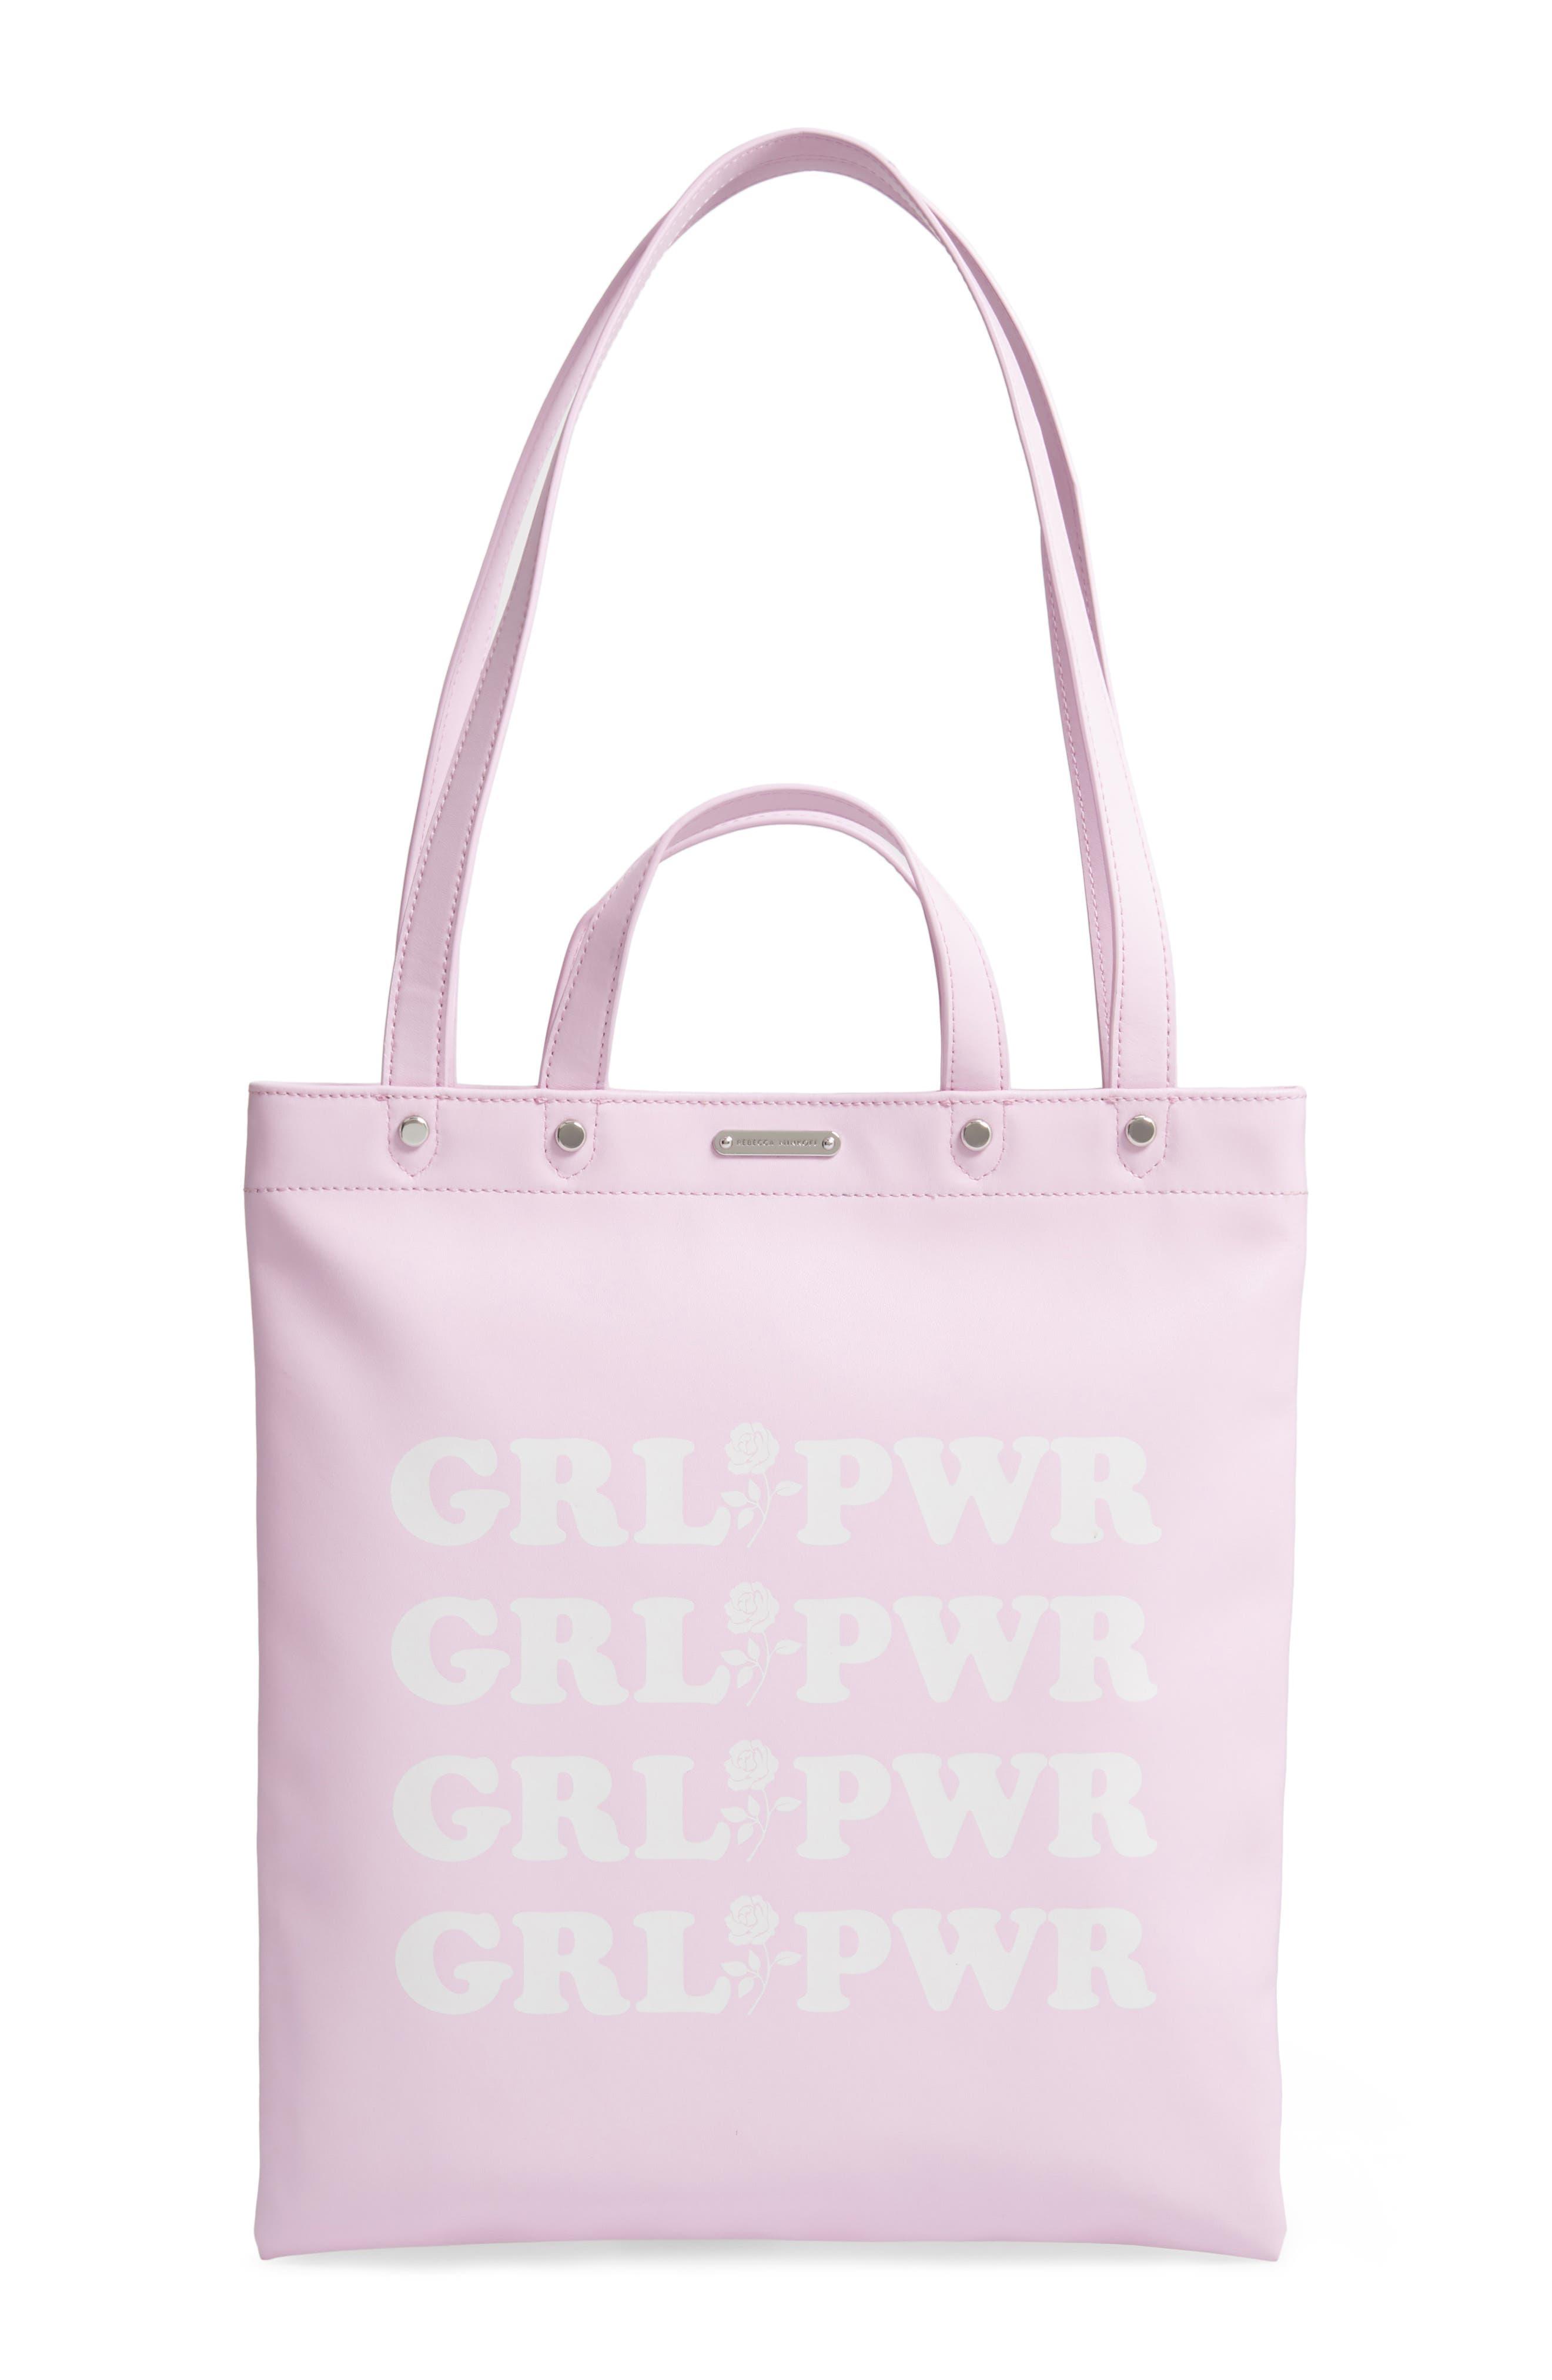 Image of Rebecca Minkoff Grl Pwr Magazine Leather Tote Bag